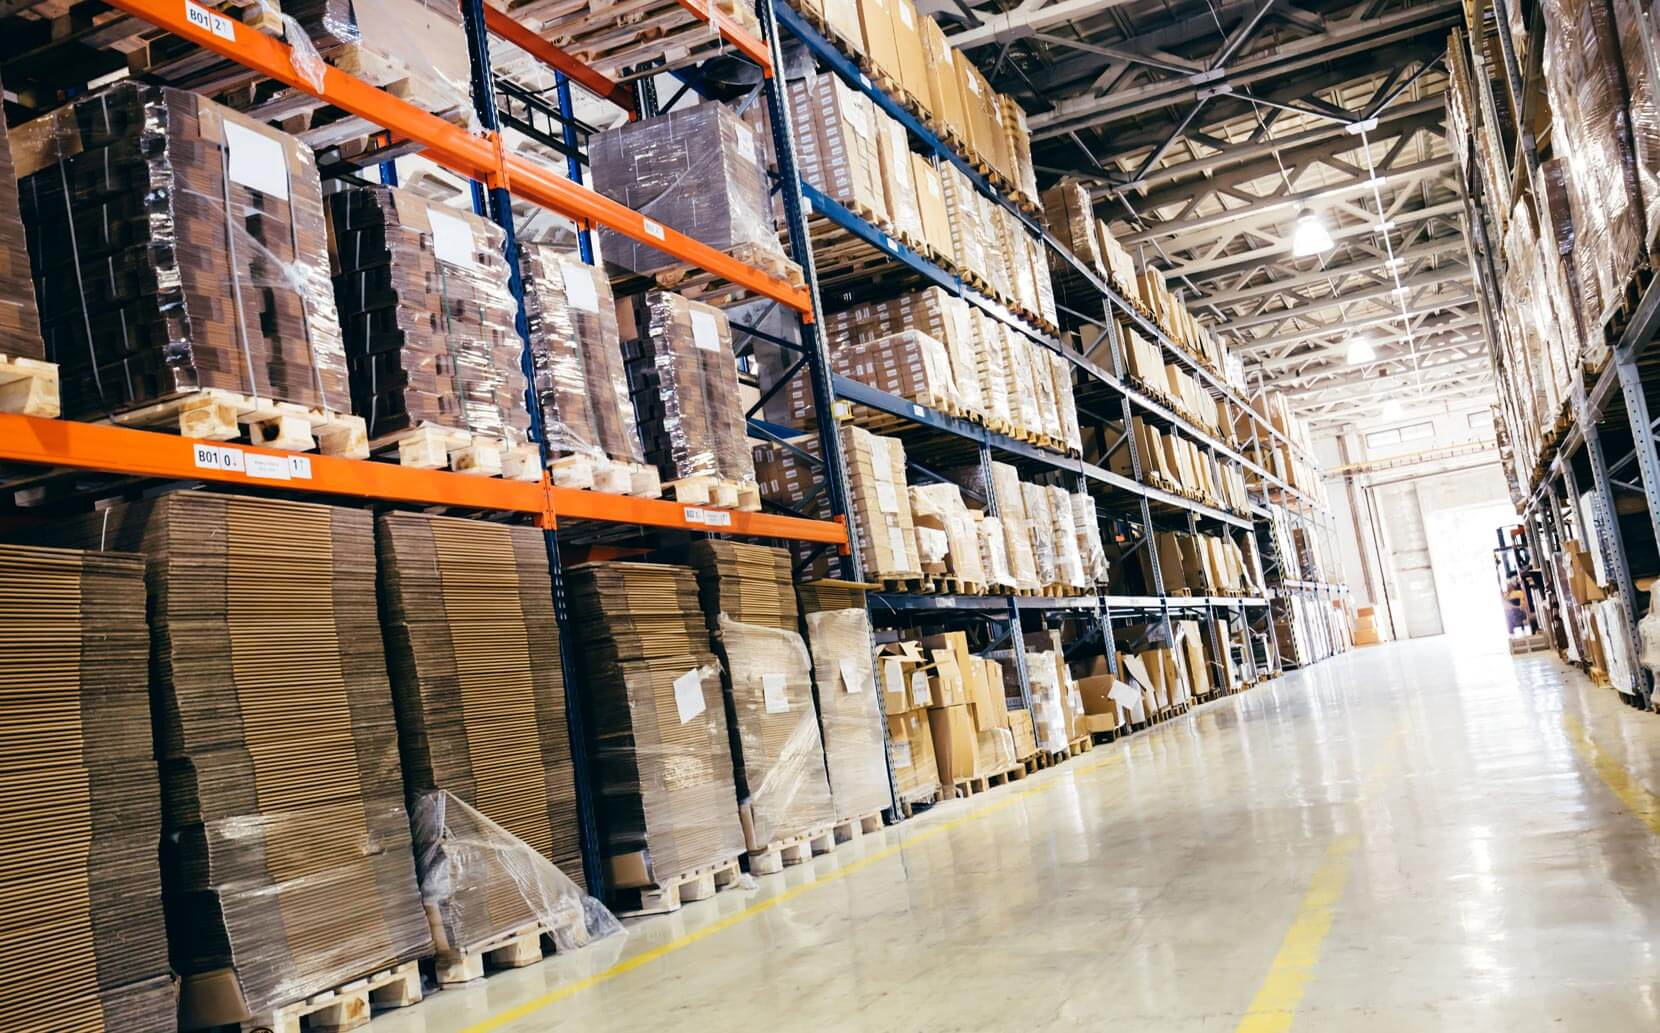 logistica - economia de energia - distribuidora de alimentos